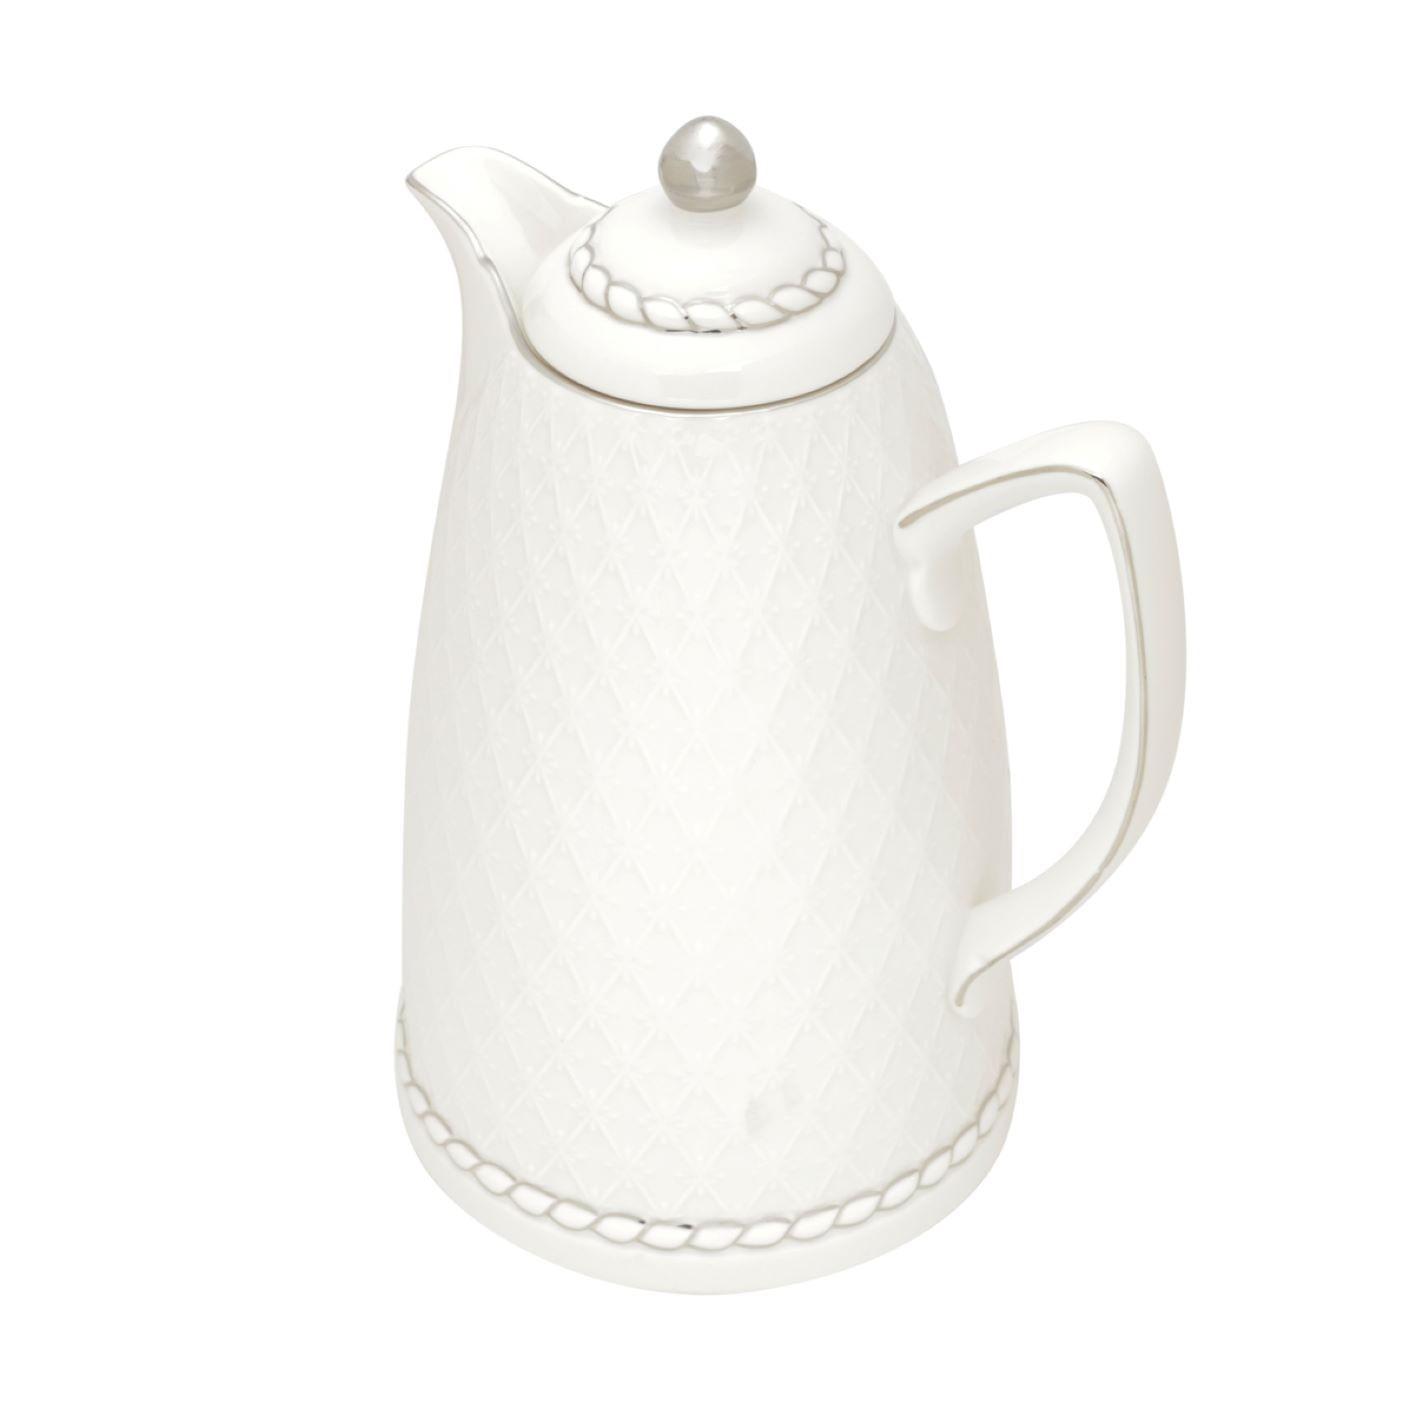 Garrafa Térmica De Porcelana Renda Branca e Prata 900ml